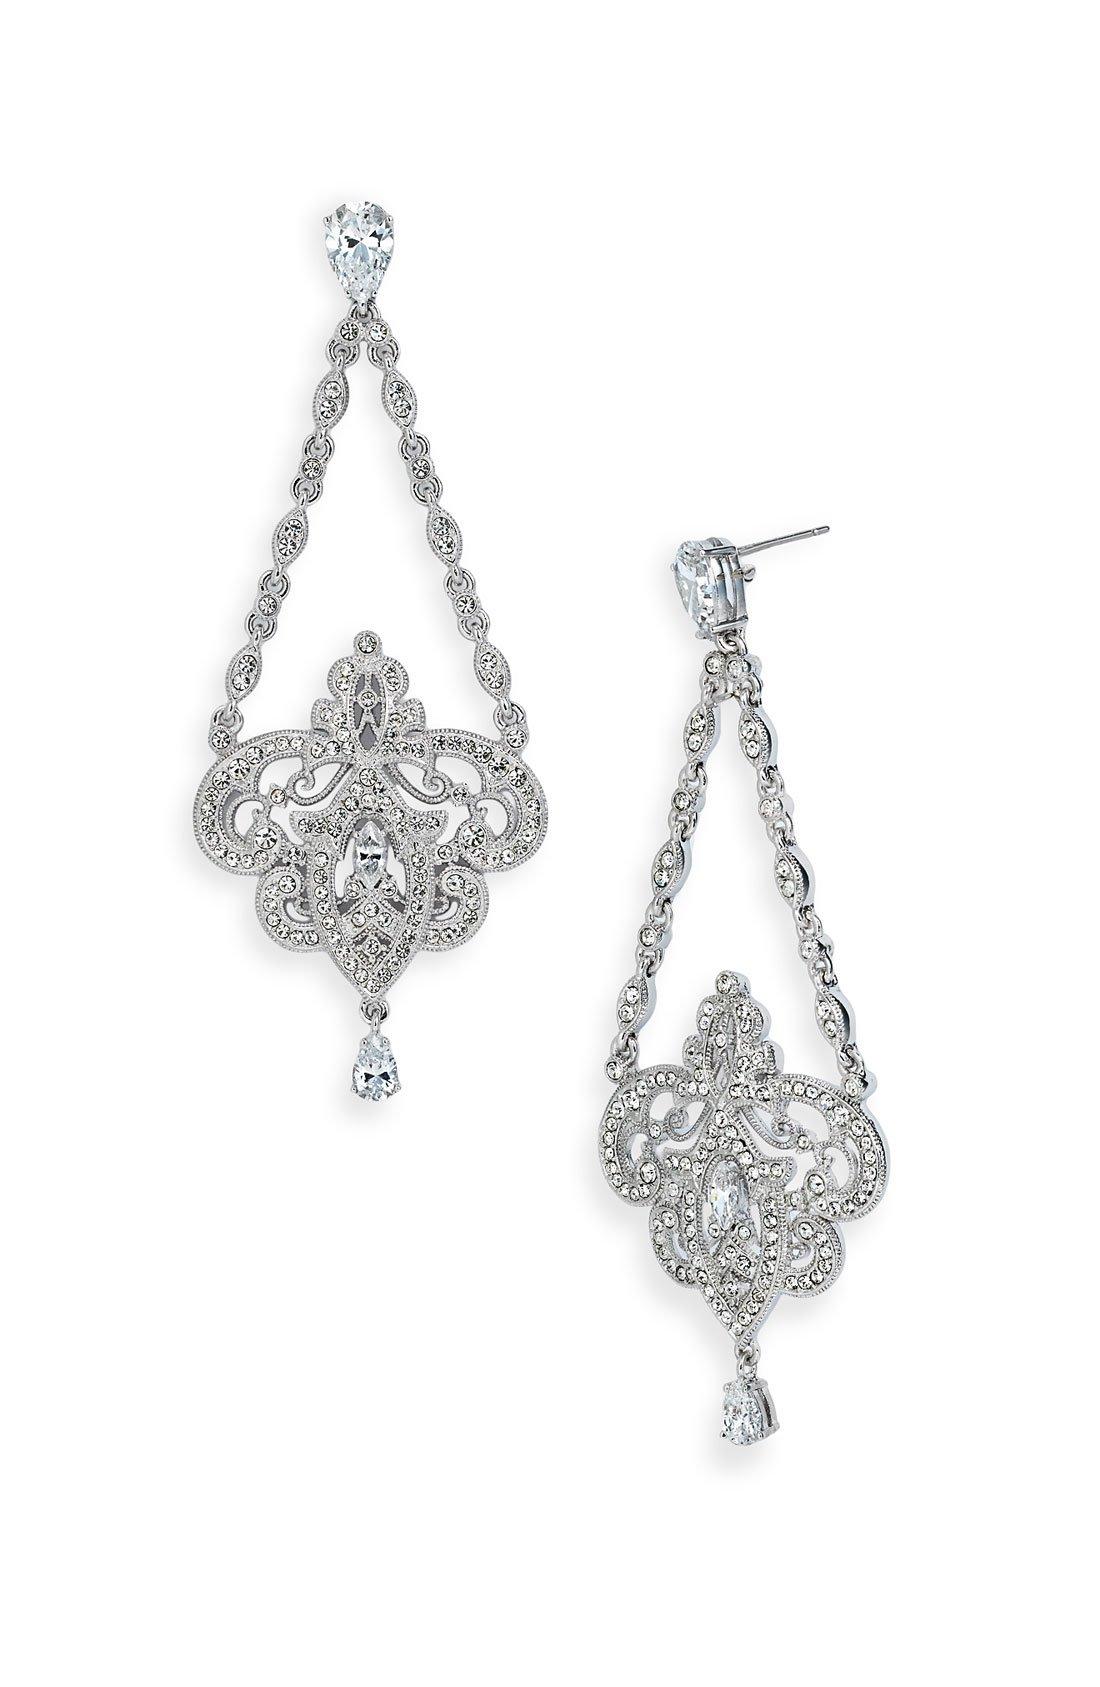 Nordstrom chandelier earrings fallcreekonline chandelier earrings nordstrom rose gold chandelier earrings arubaitofo Image collections